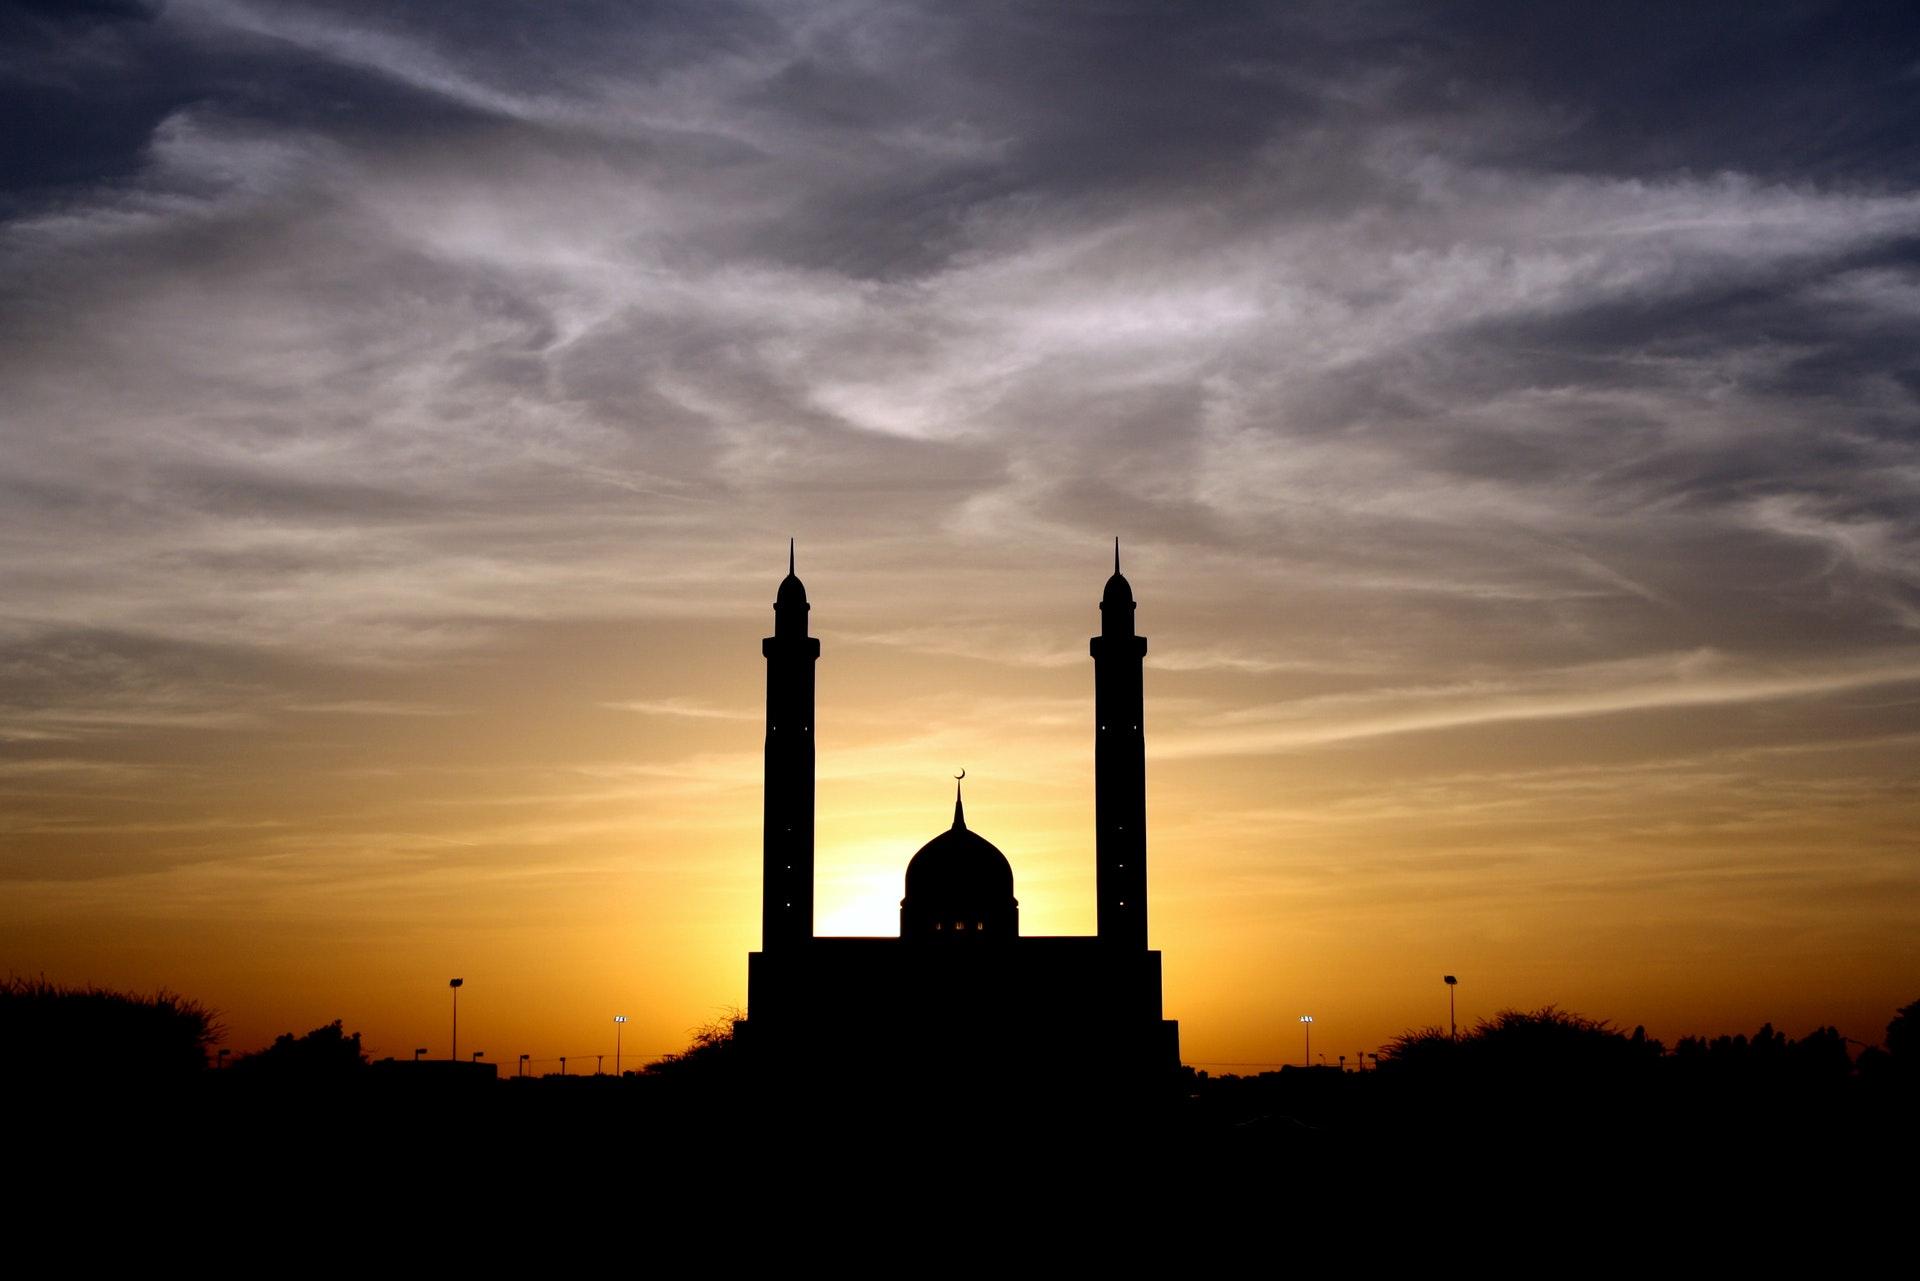 moske, muslim, religion, tro, troende